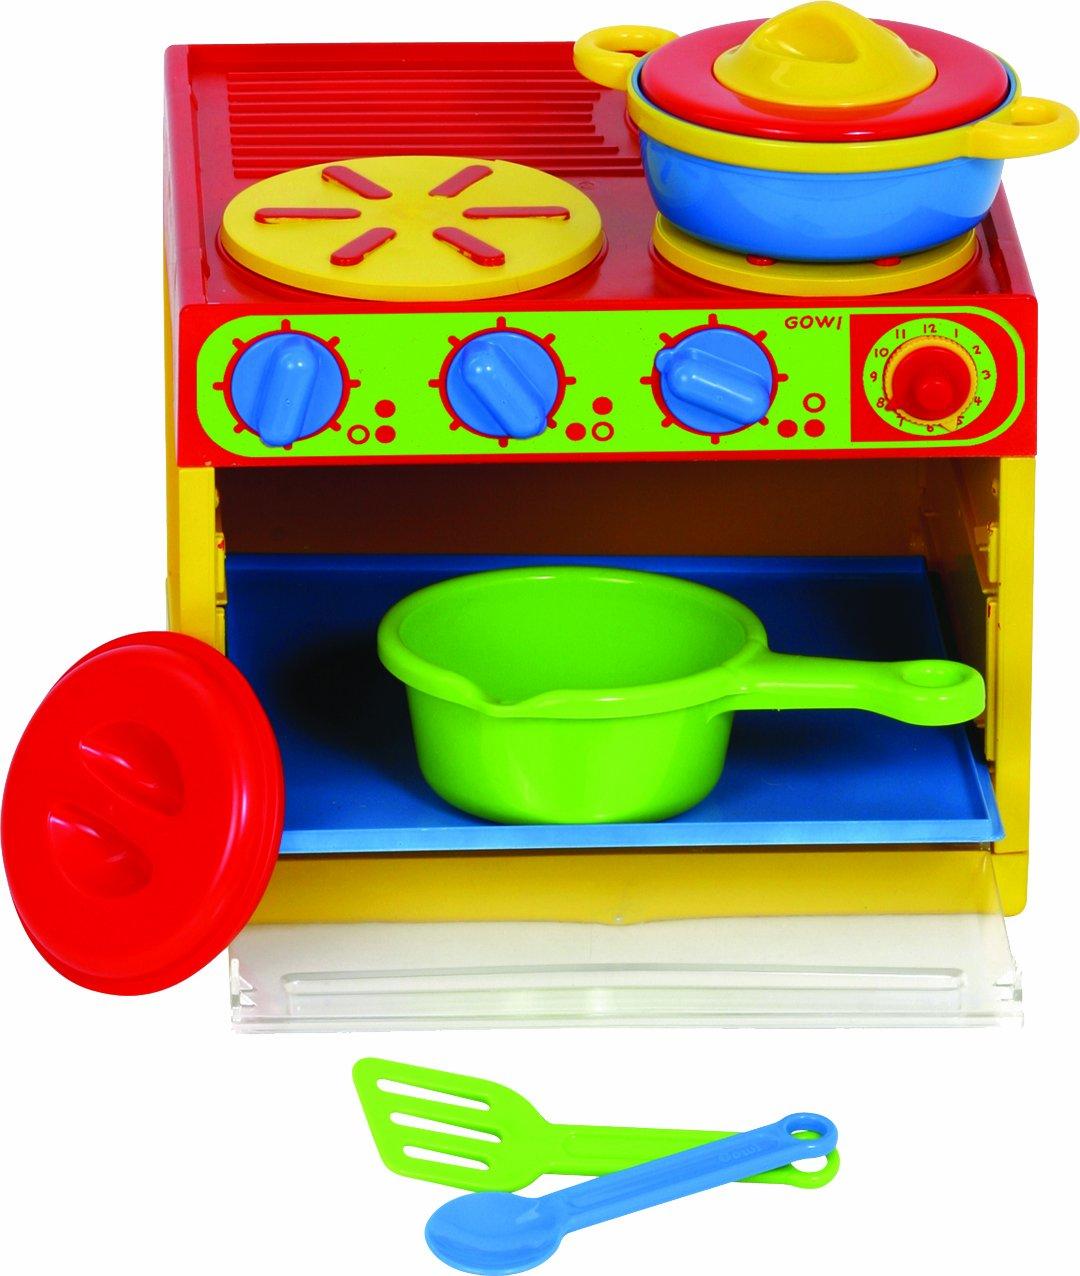 Gowi 454-91 3-er Herd, Küchenspielzeug, 7 teilig: Amazon.de: Spielzeug